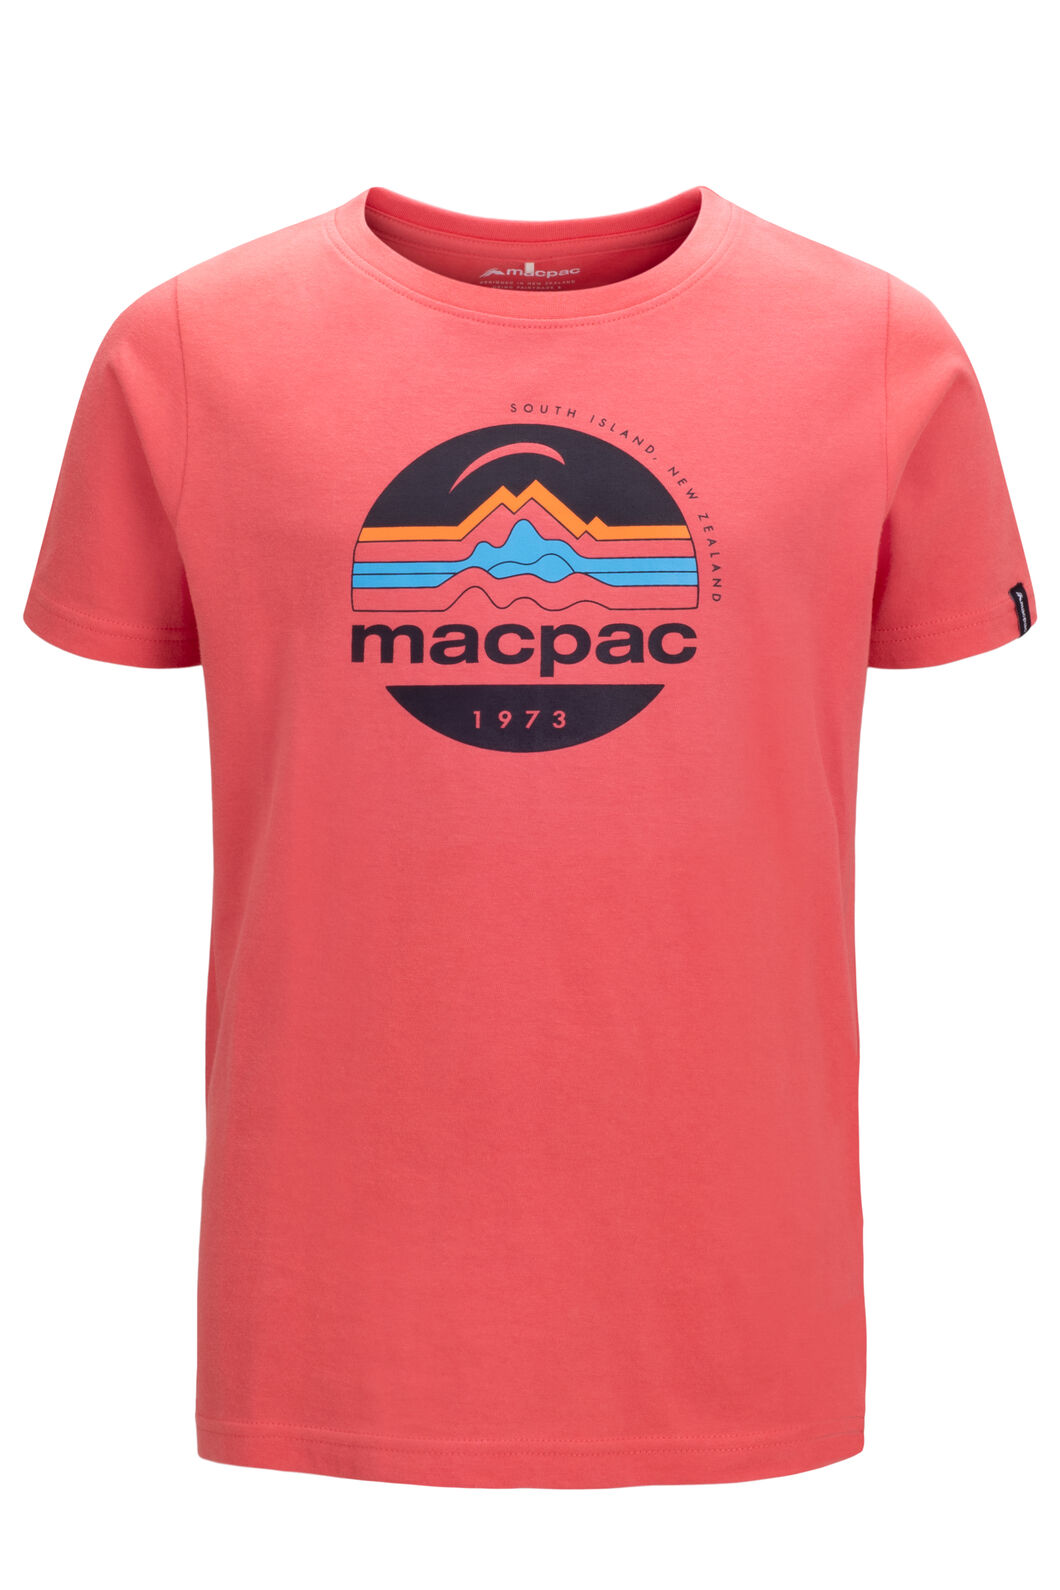 Macpac Kids' Retro Short Sleeve Tee, Spiced Coral, hi-res